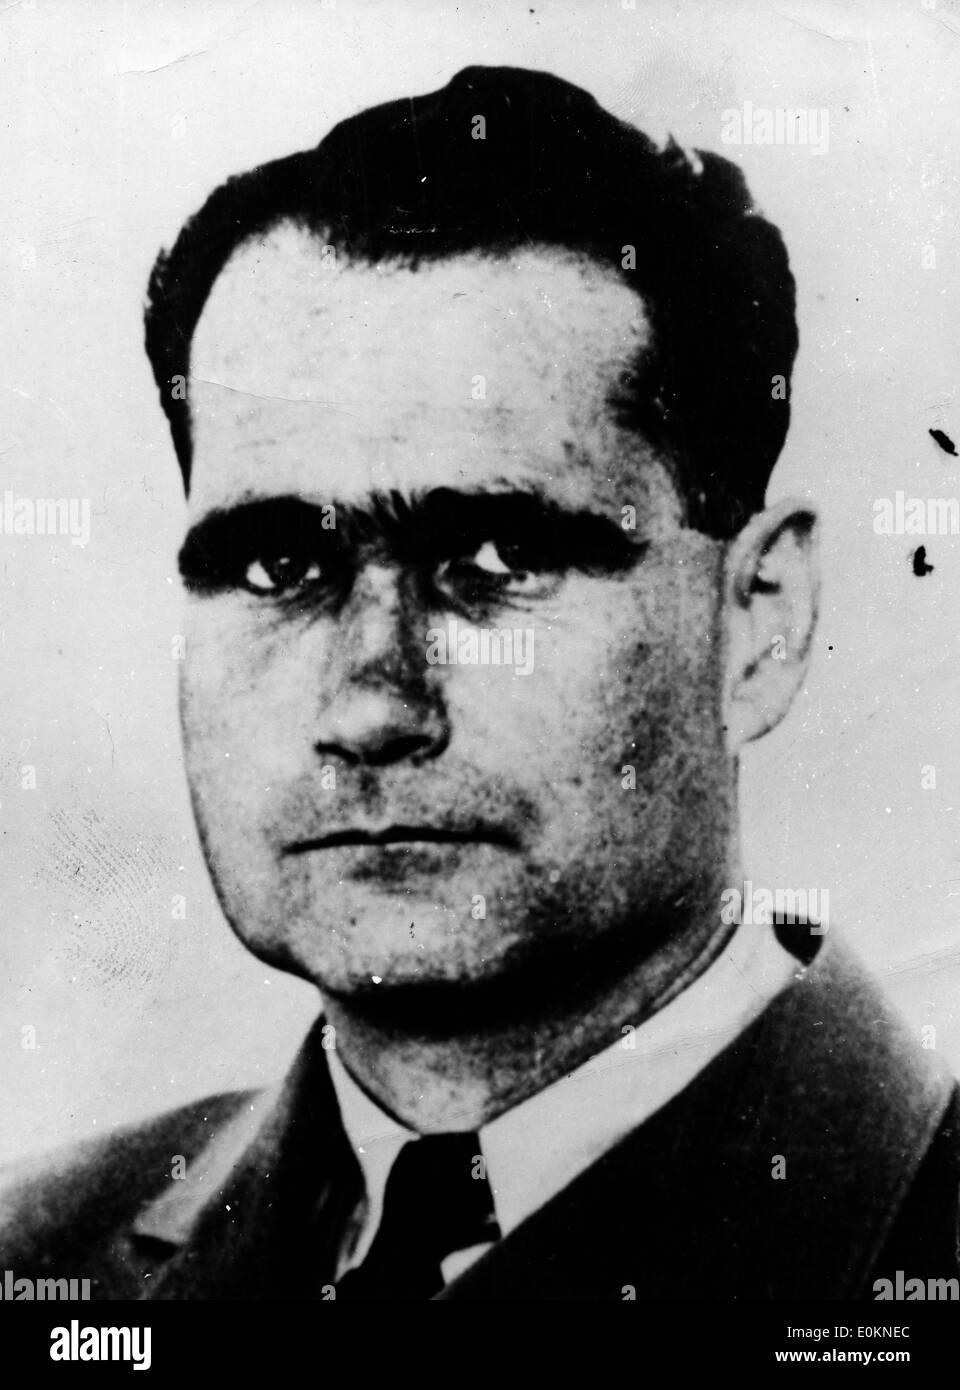 Jan. 01, 1930 - Germany - File Photo: circa 1930s-1940s. File Photo A portrait of Nazi leader RUDOLF HESS. - Stock Image